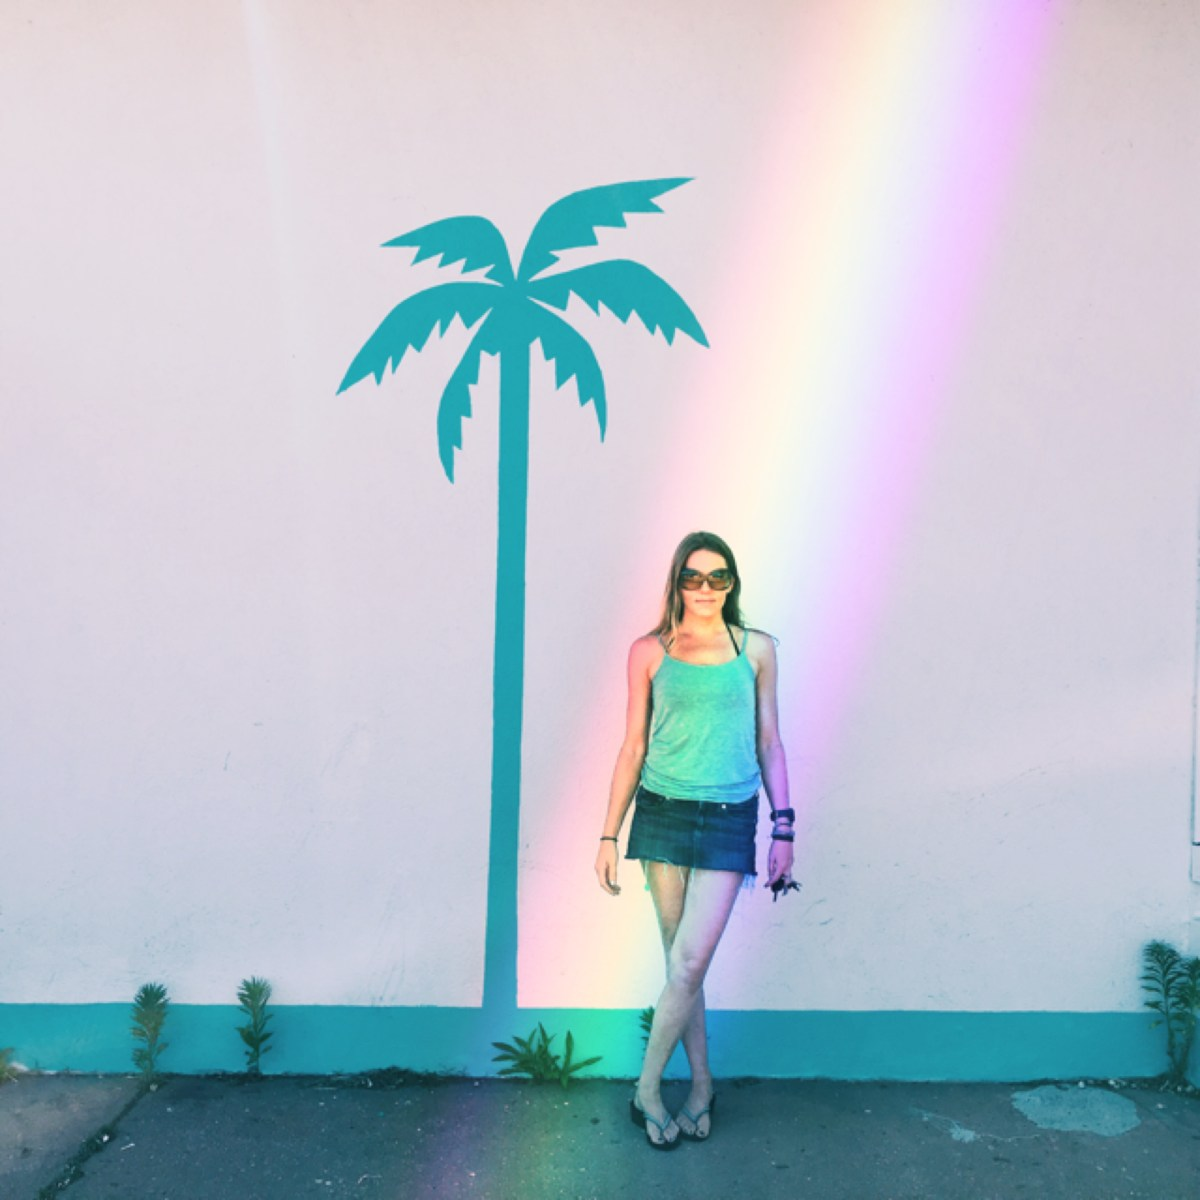 Best-Rainbow-Photo-Filters-And-Rainbow-Photo-Editor-App-3